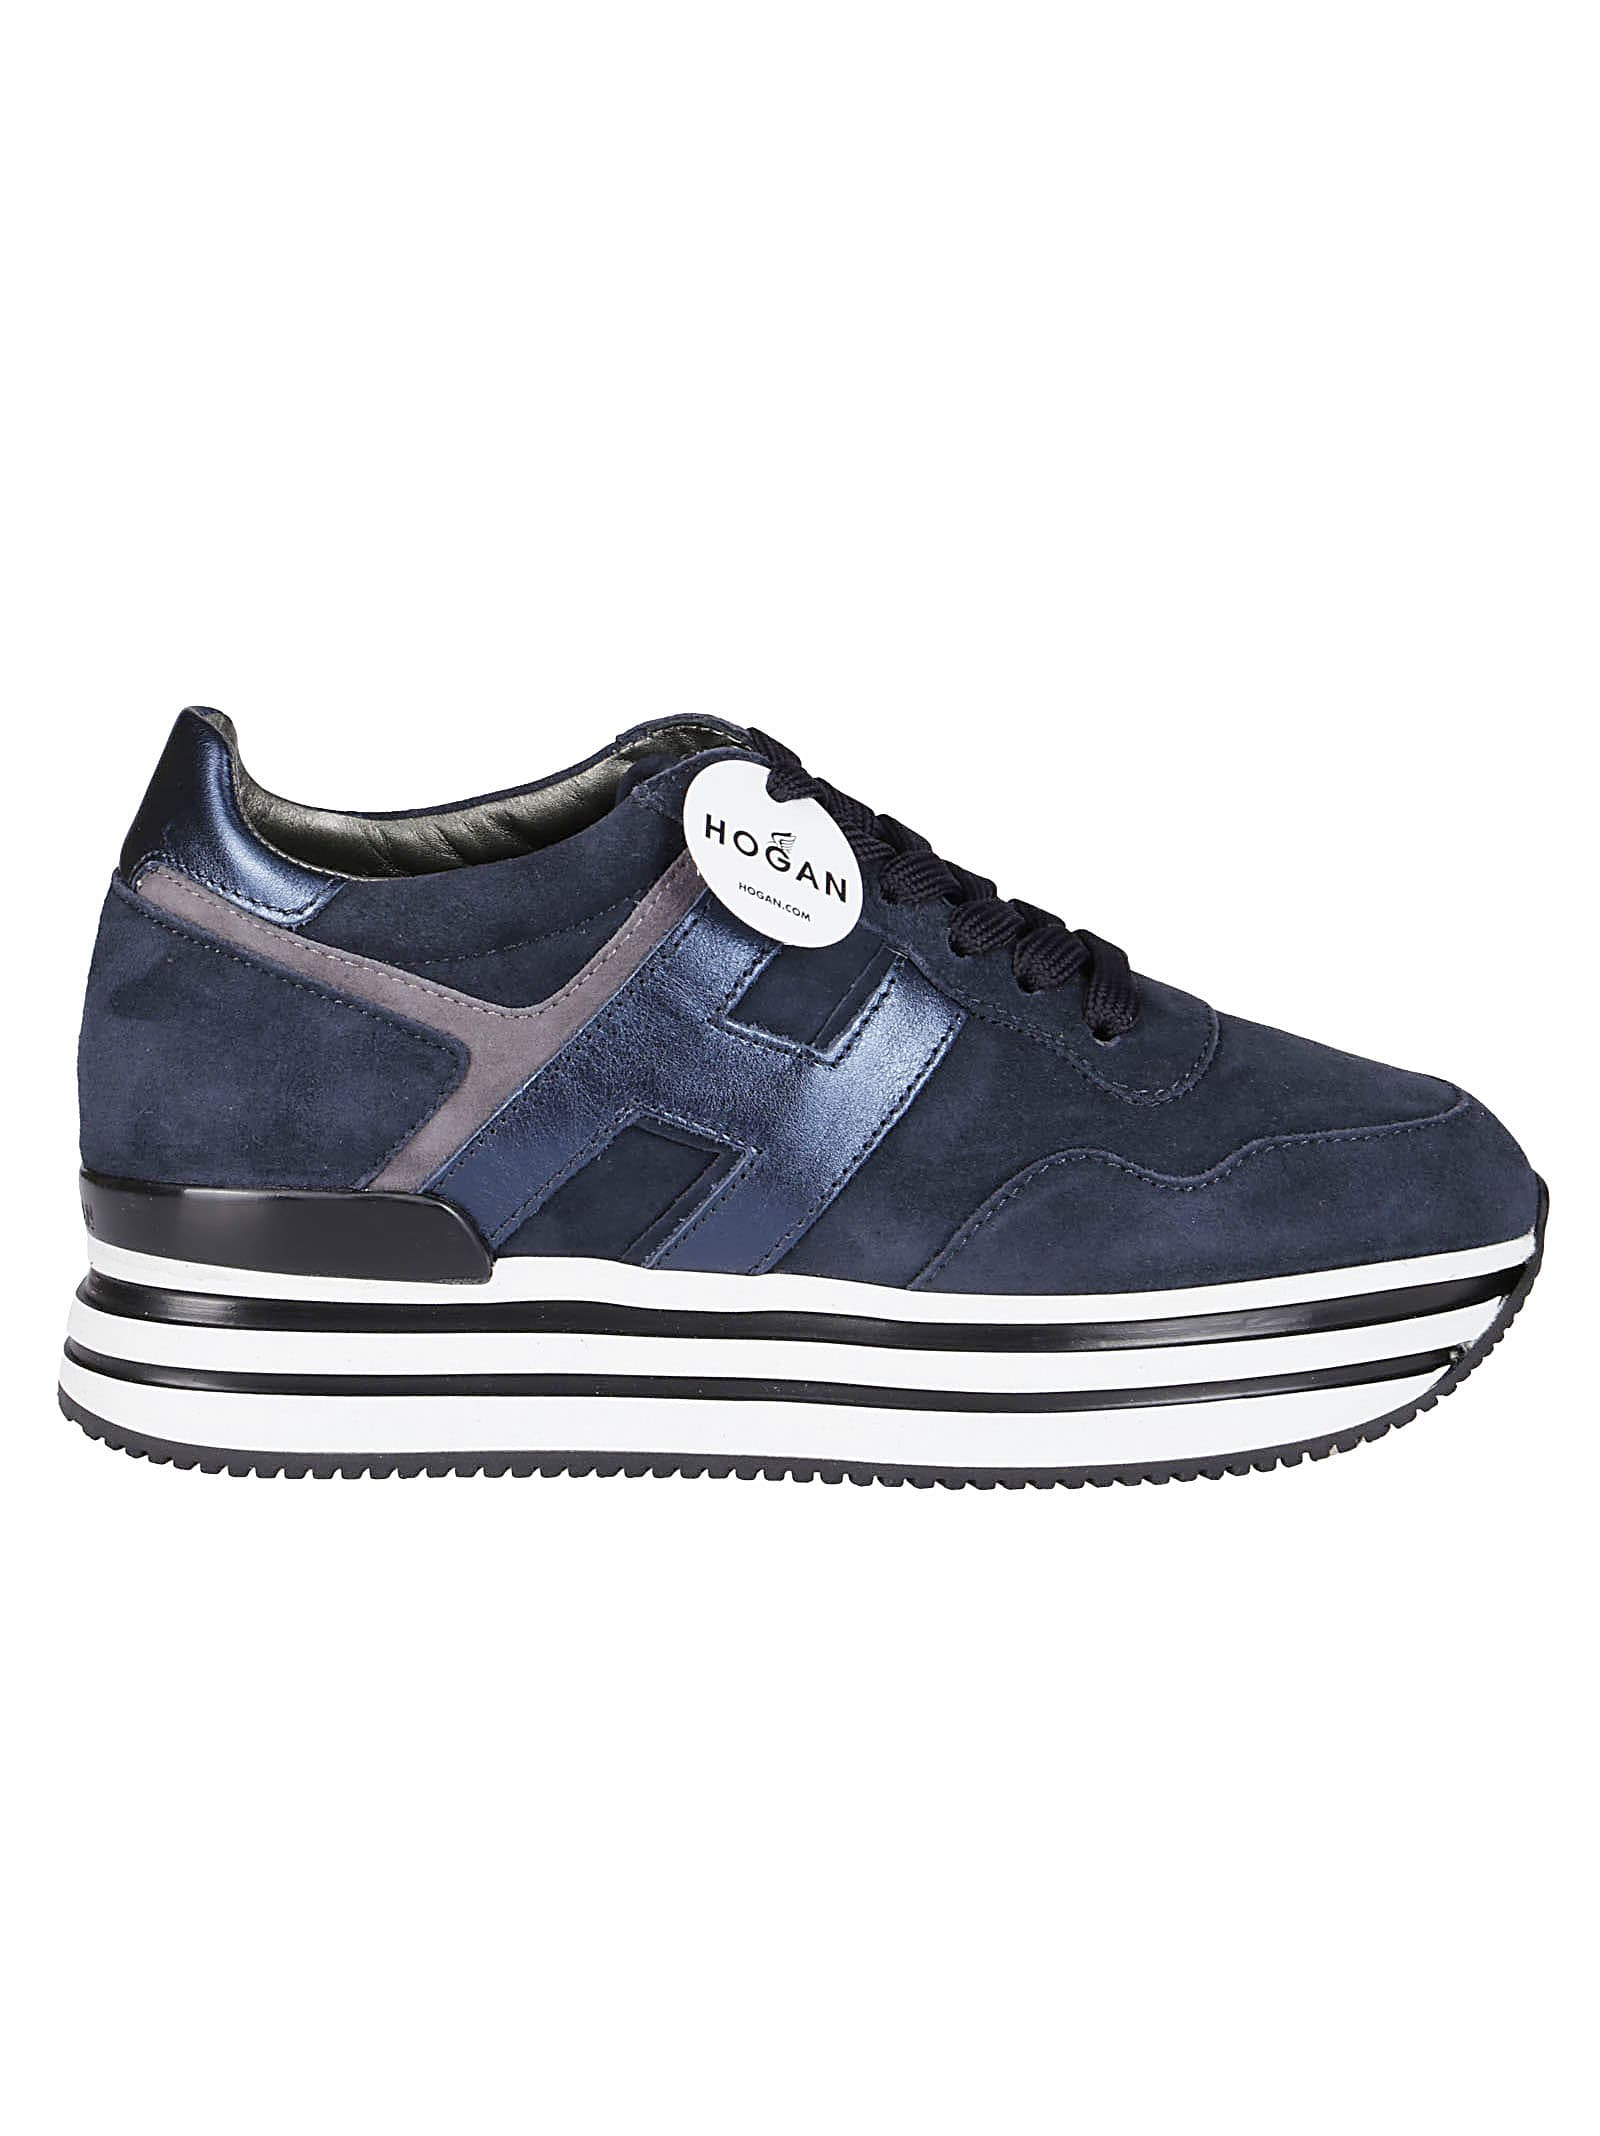 Hogan Laced Shoes   italist, ALWAYS